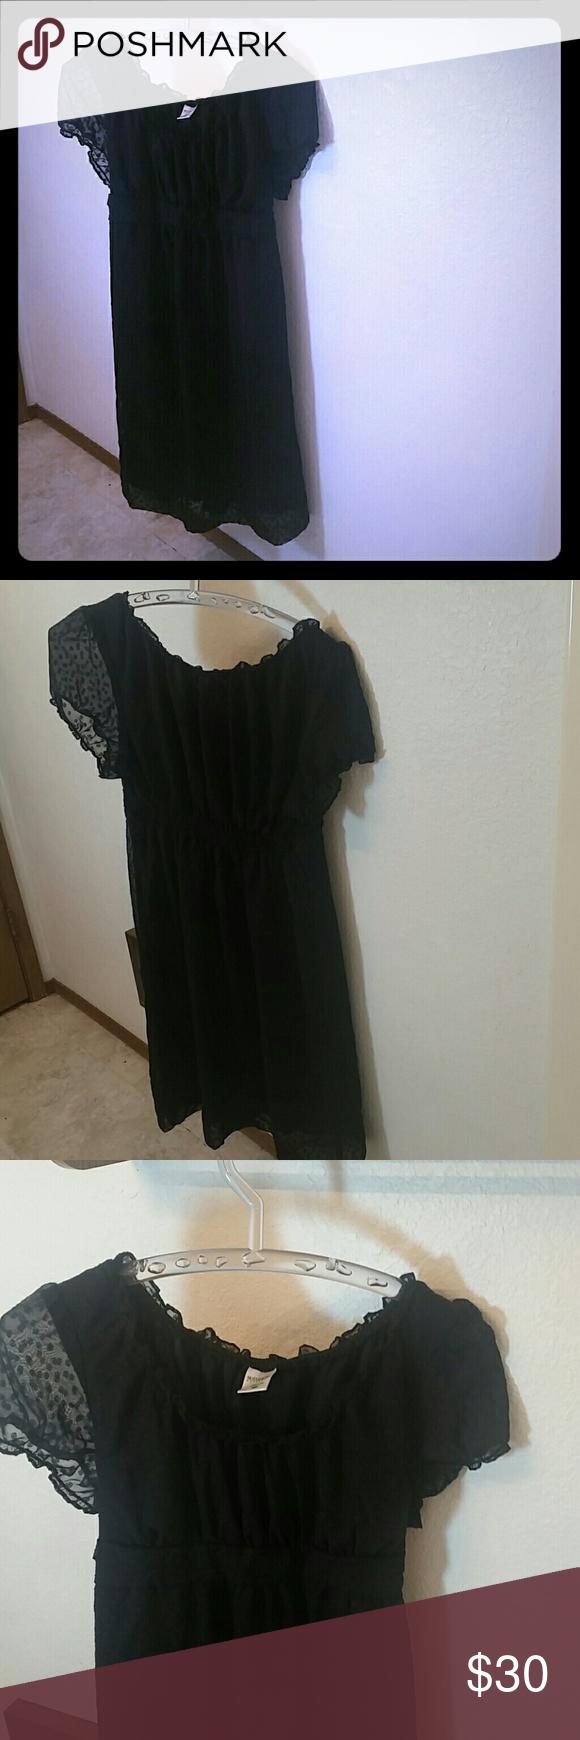 Dress Black polka dot dress Motherhood Maternity Dresses Midi